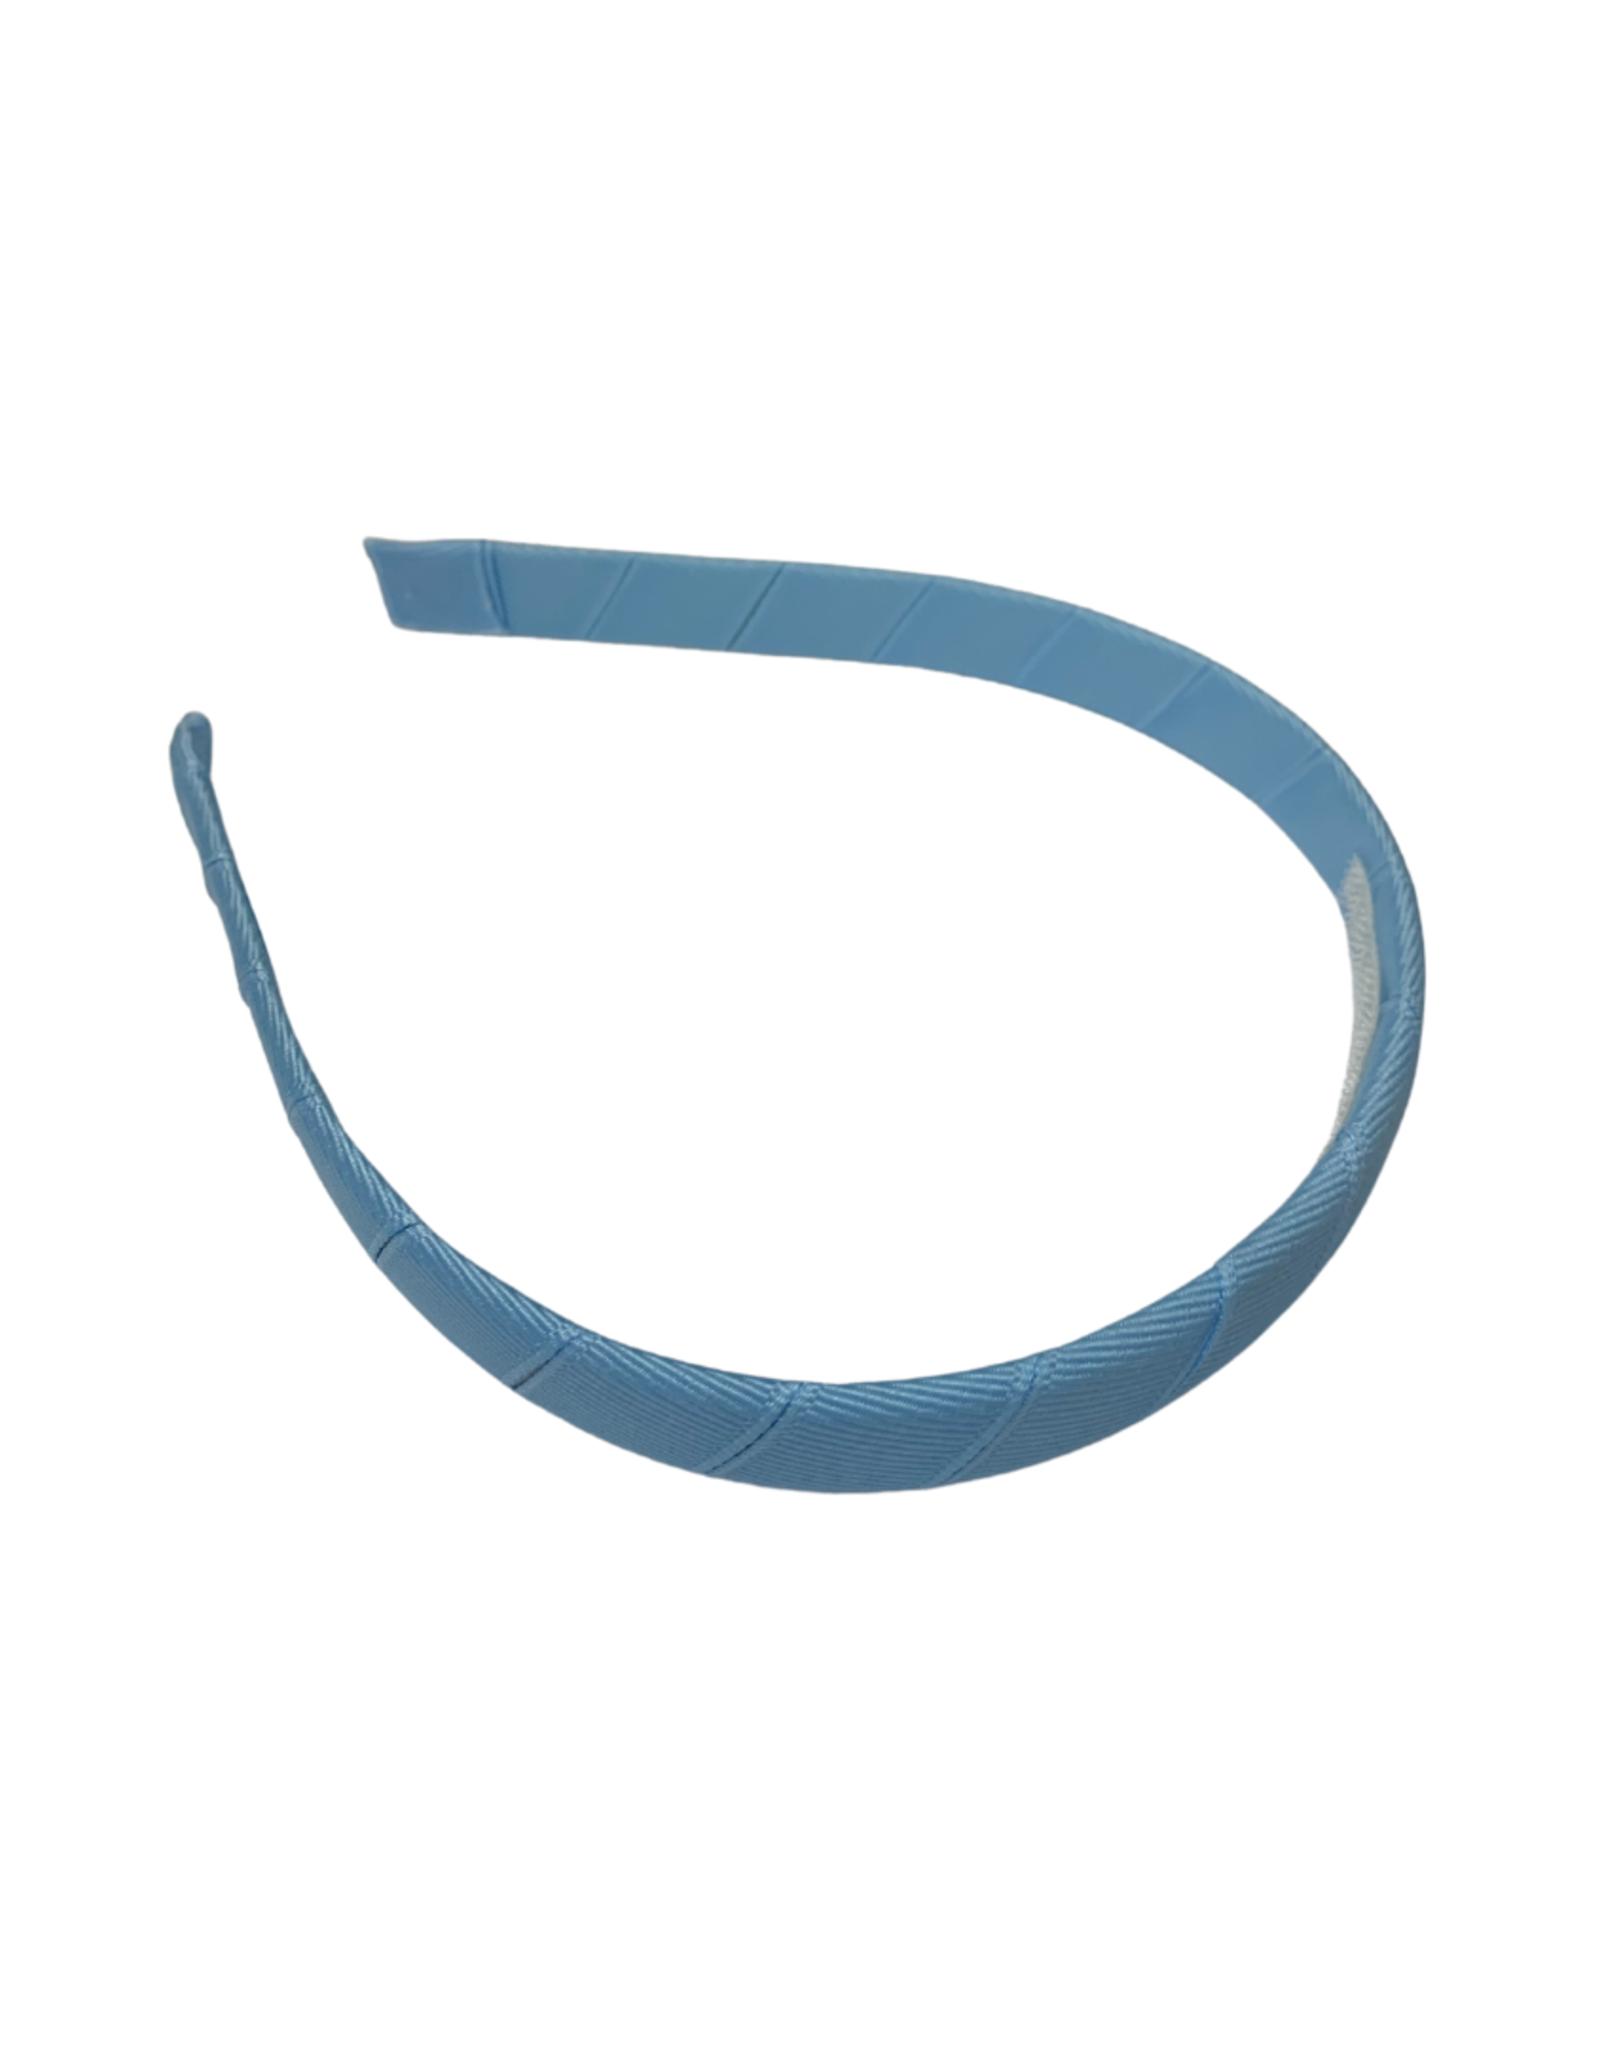 "Bows Arts Headband 1/2"" - Light Blue"